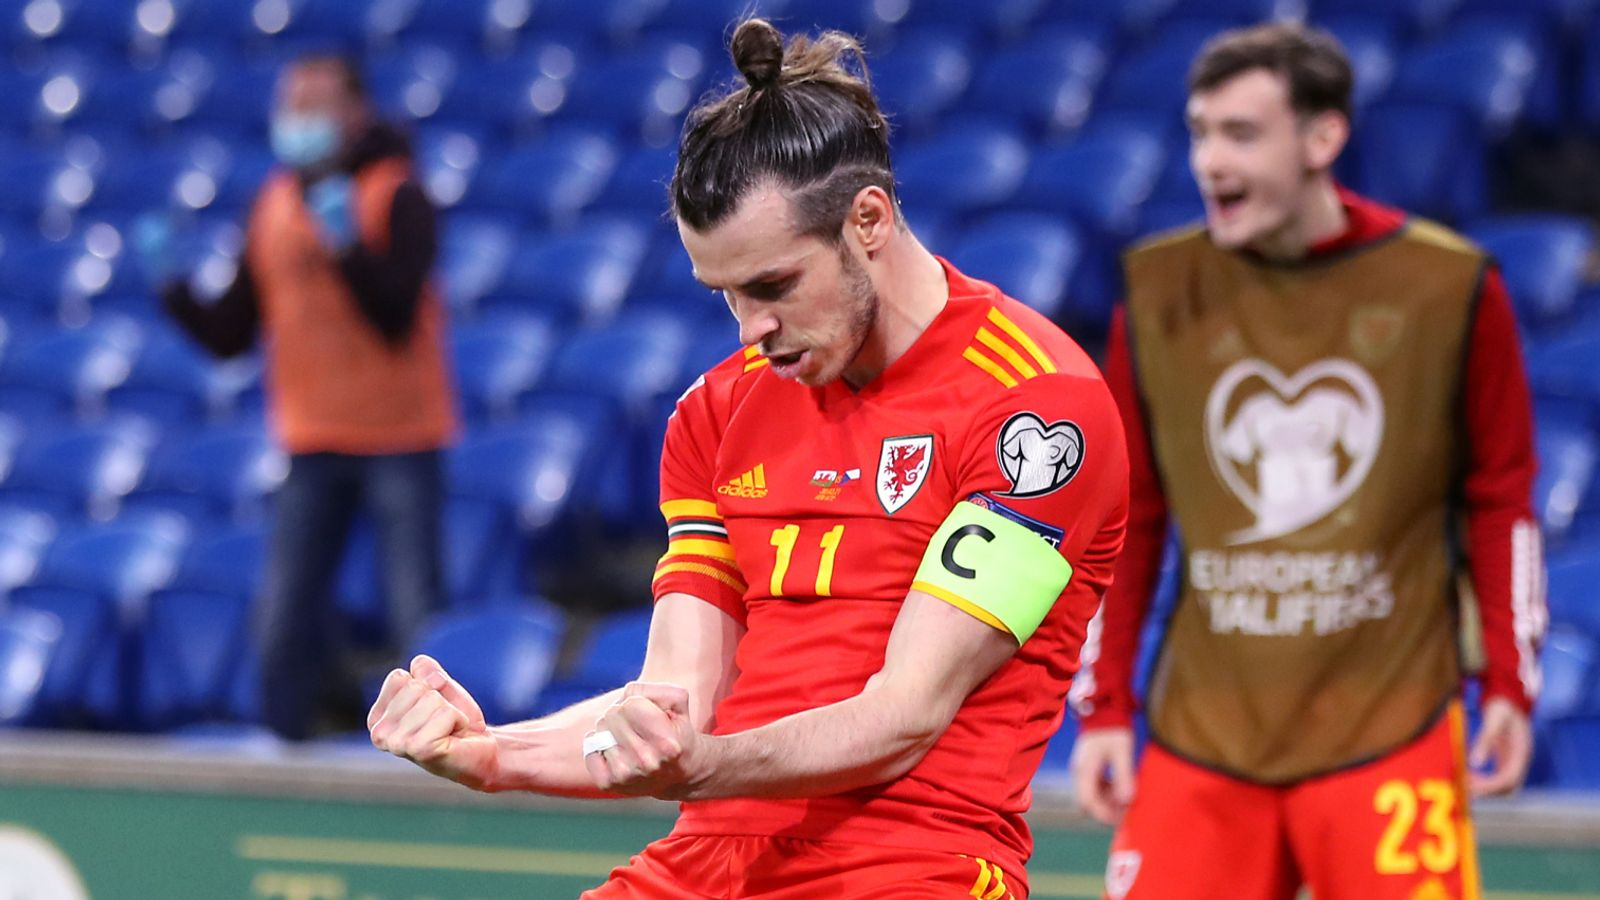 Gareth Bale: Wales captain hails 'massive' win over Czech Republic